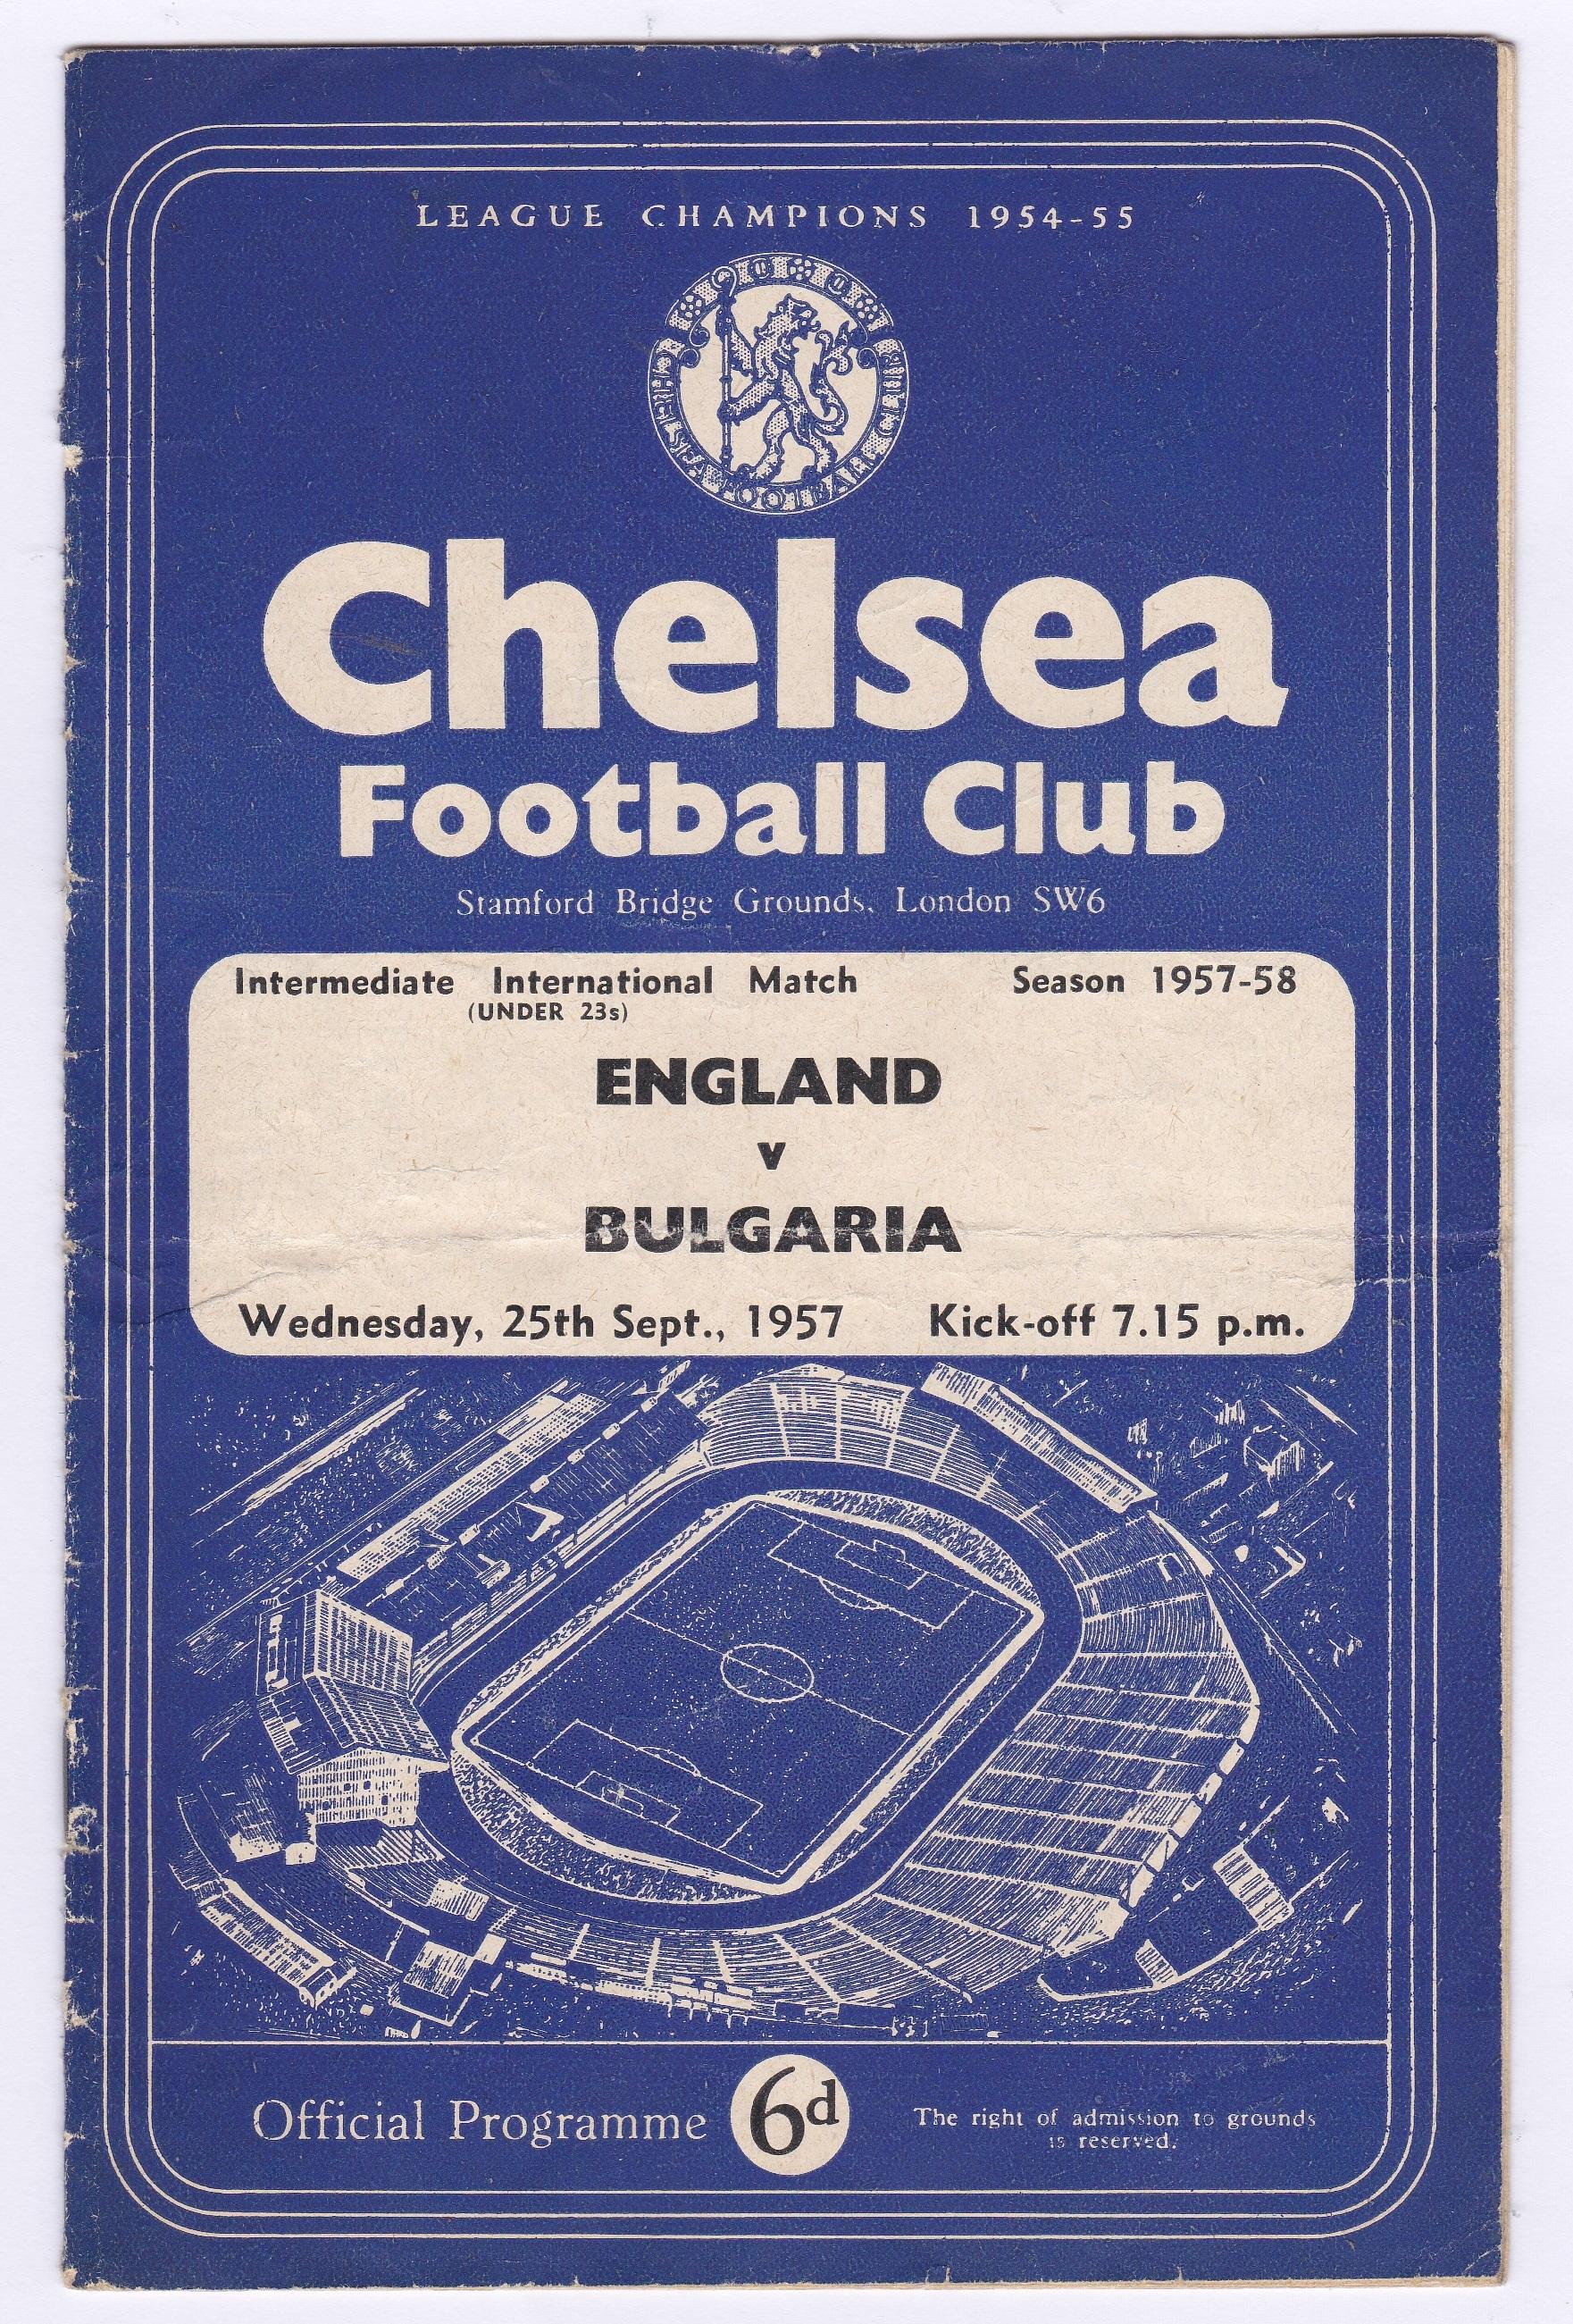 England v Bulgaria 1957 September 25th Intermediate International Match under 23's horizontal &